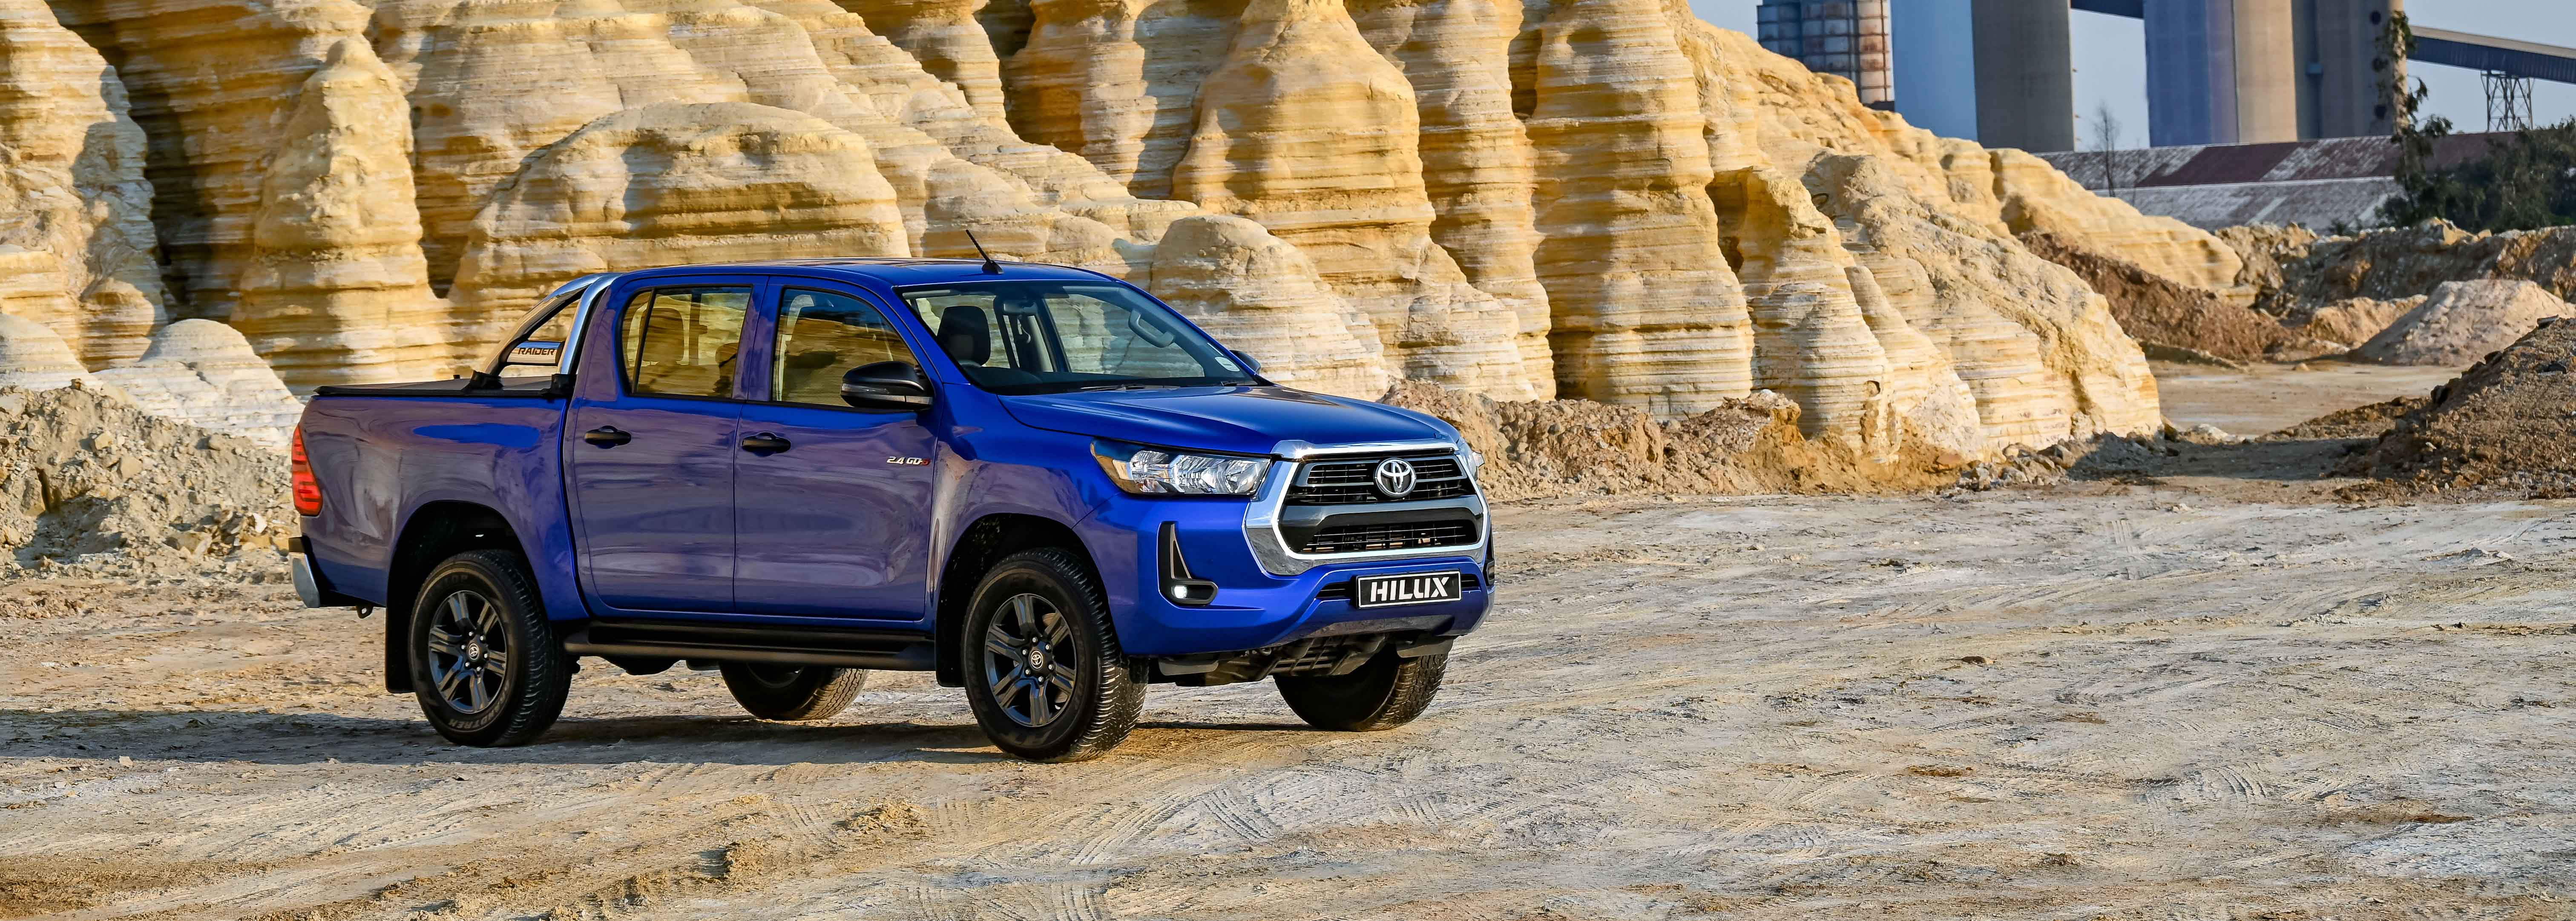 Toyota Hilux Raider receives specification upgrades video-banner